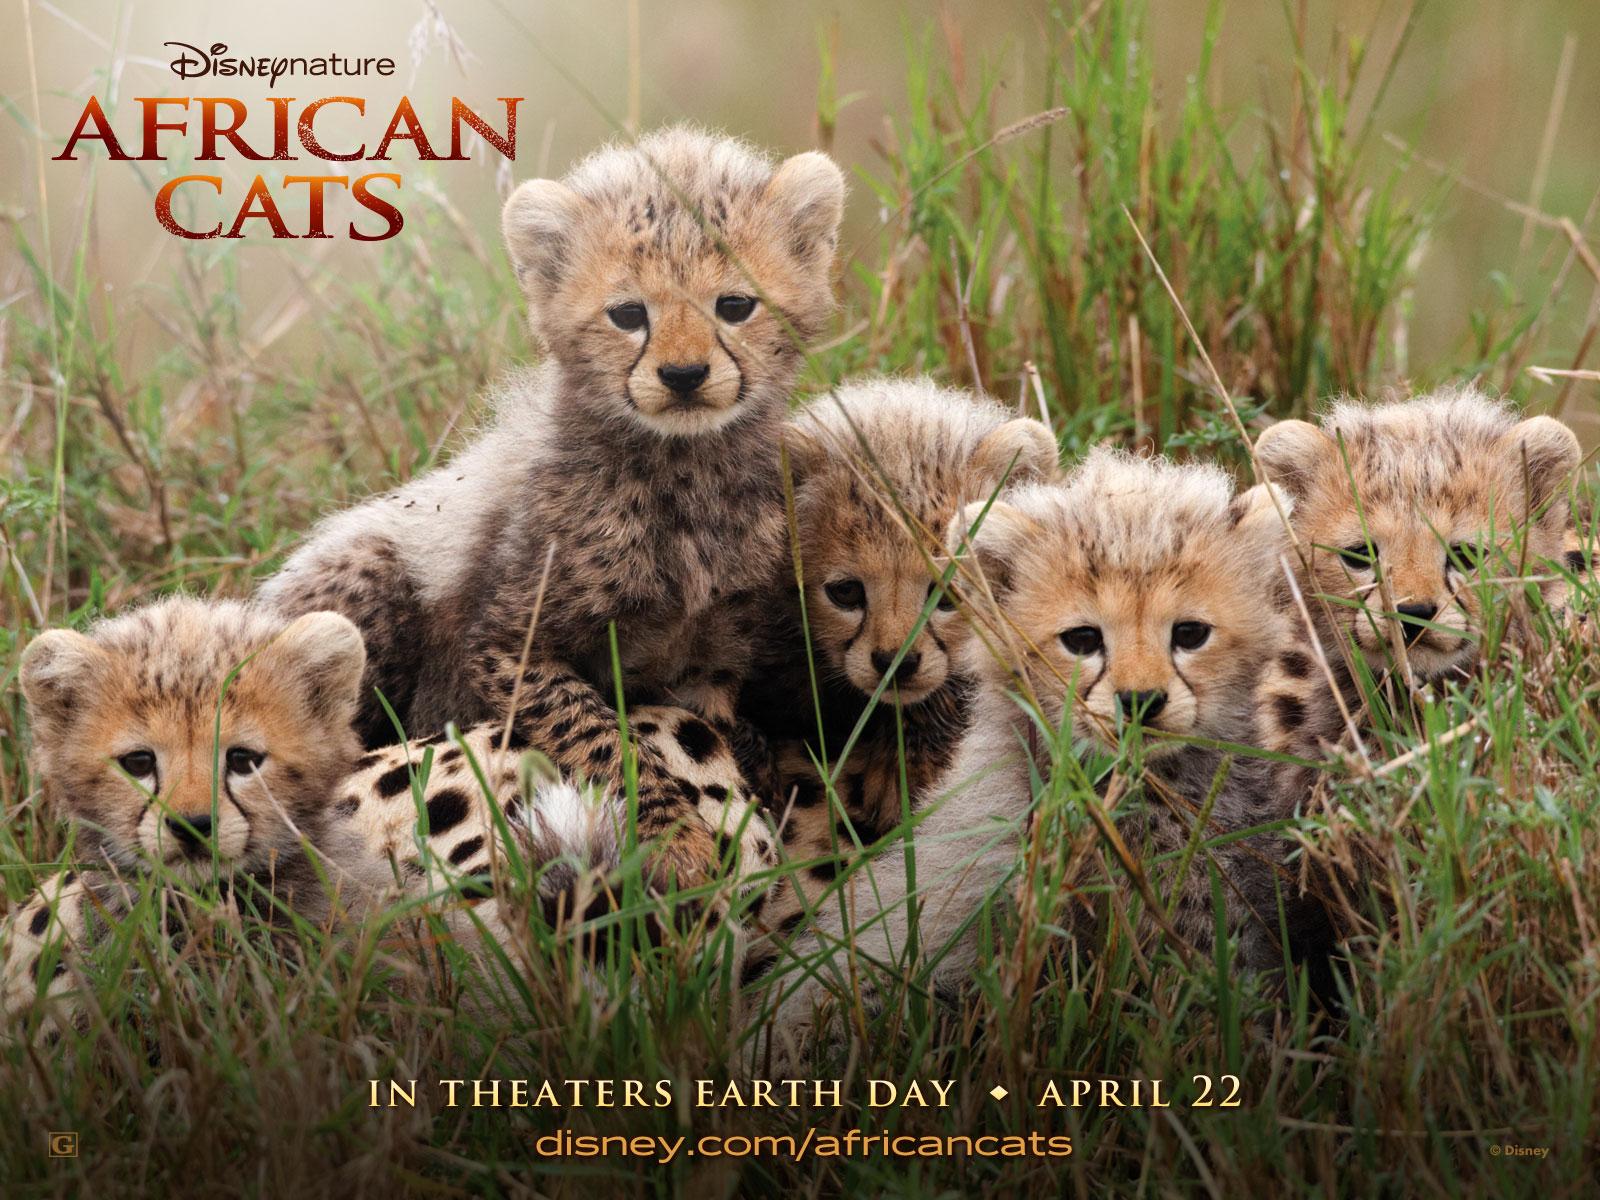 http://3.bp.blogspot.com/-olr9v8xdUQg/TacdHssvU-I/AAAAAAAAAbg/sp4Ywxq_SnU/s1600/African-Cats-Wallpapers-1600x1200-1.jpg